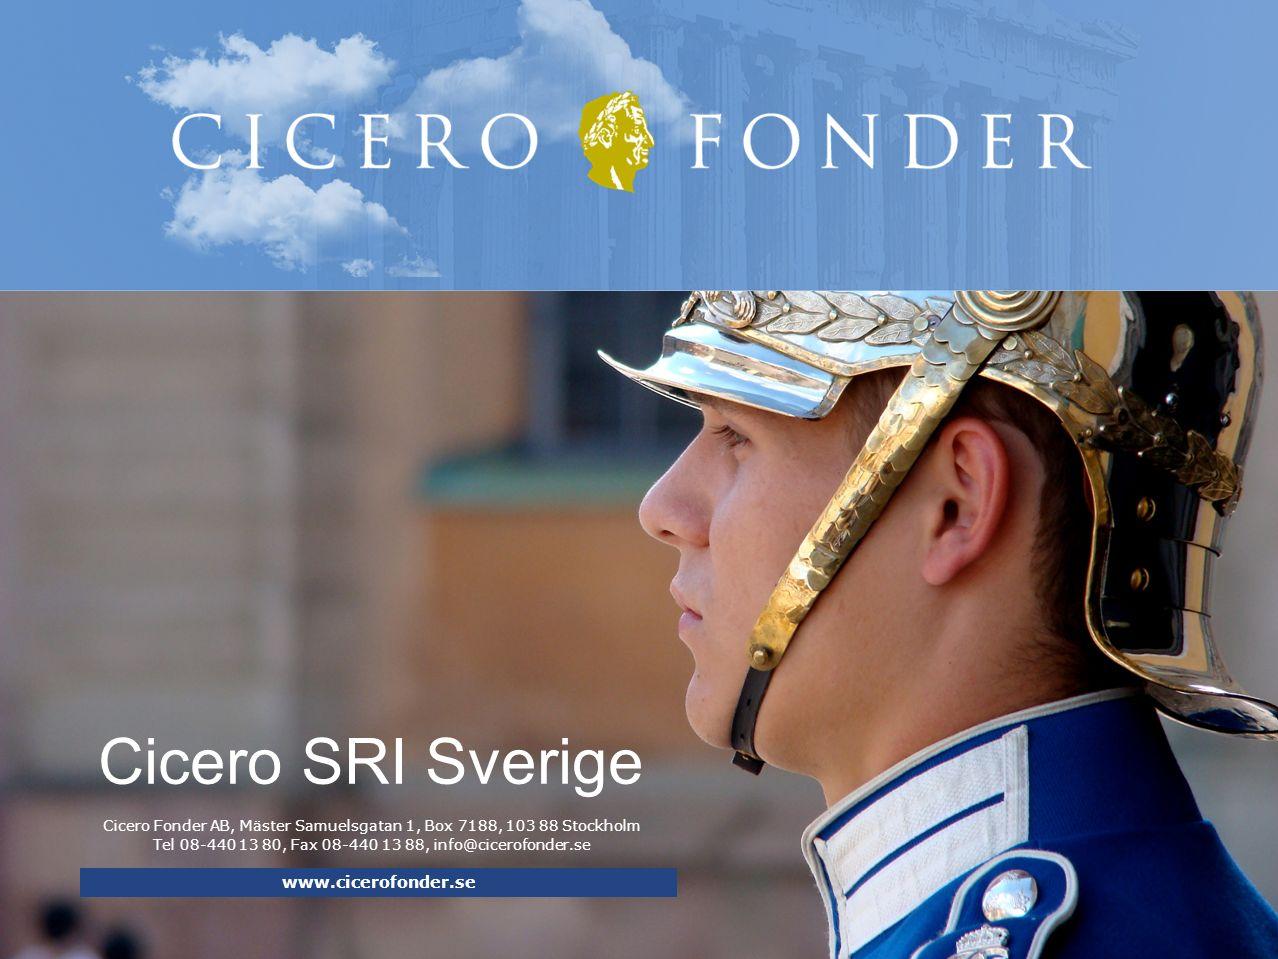 Cicero Fonder AB, Mäster Samuelsgatan 1, Box 7188, 103 88 Stockholm Tel 08-440 13 80, Fax 08-440 13 88, info@cicerofonder.se Cicero SRI Sverige www.ci